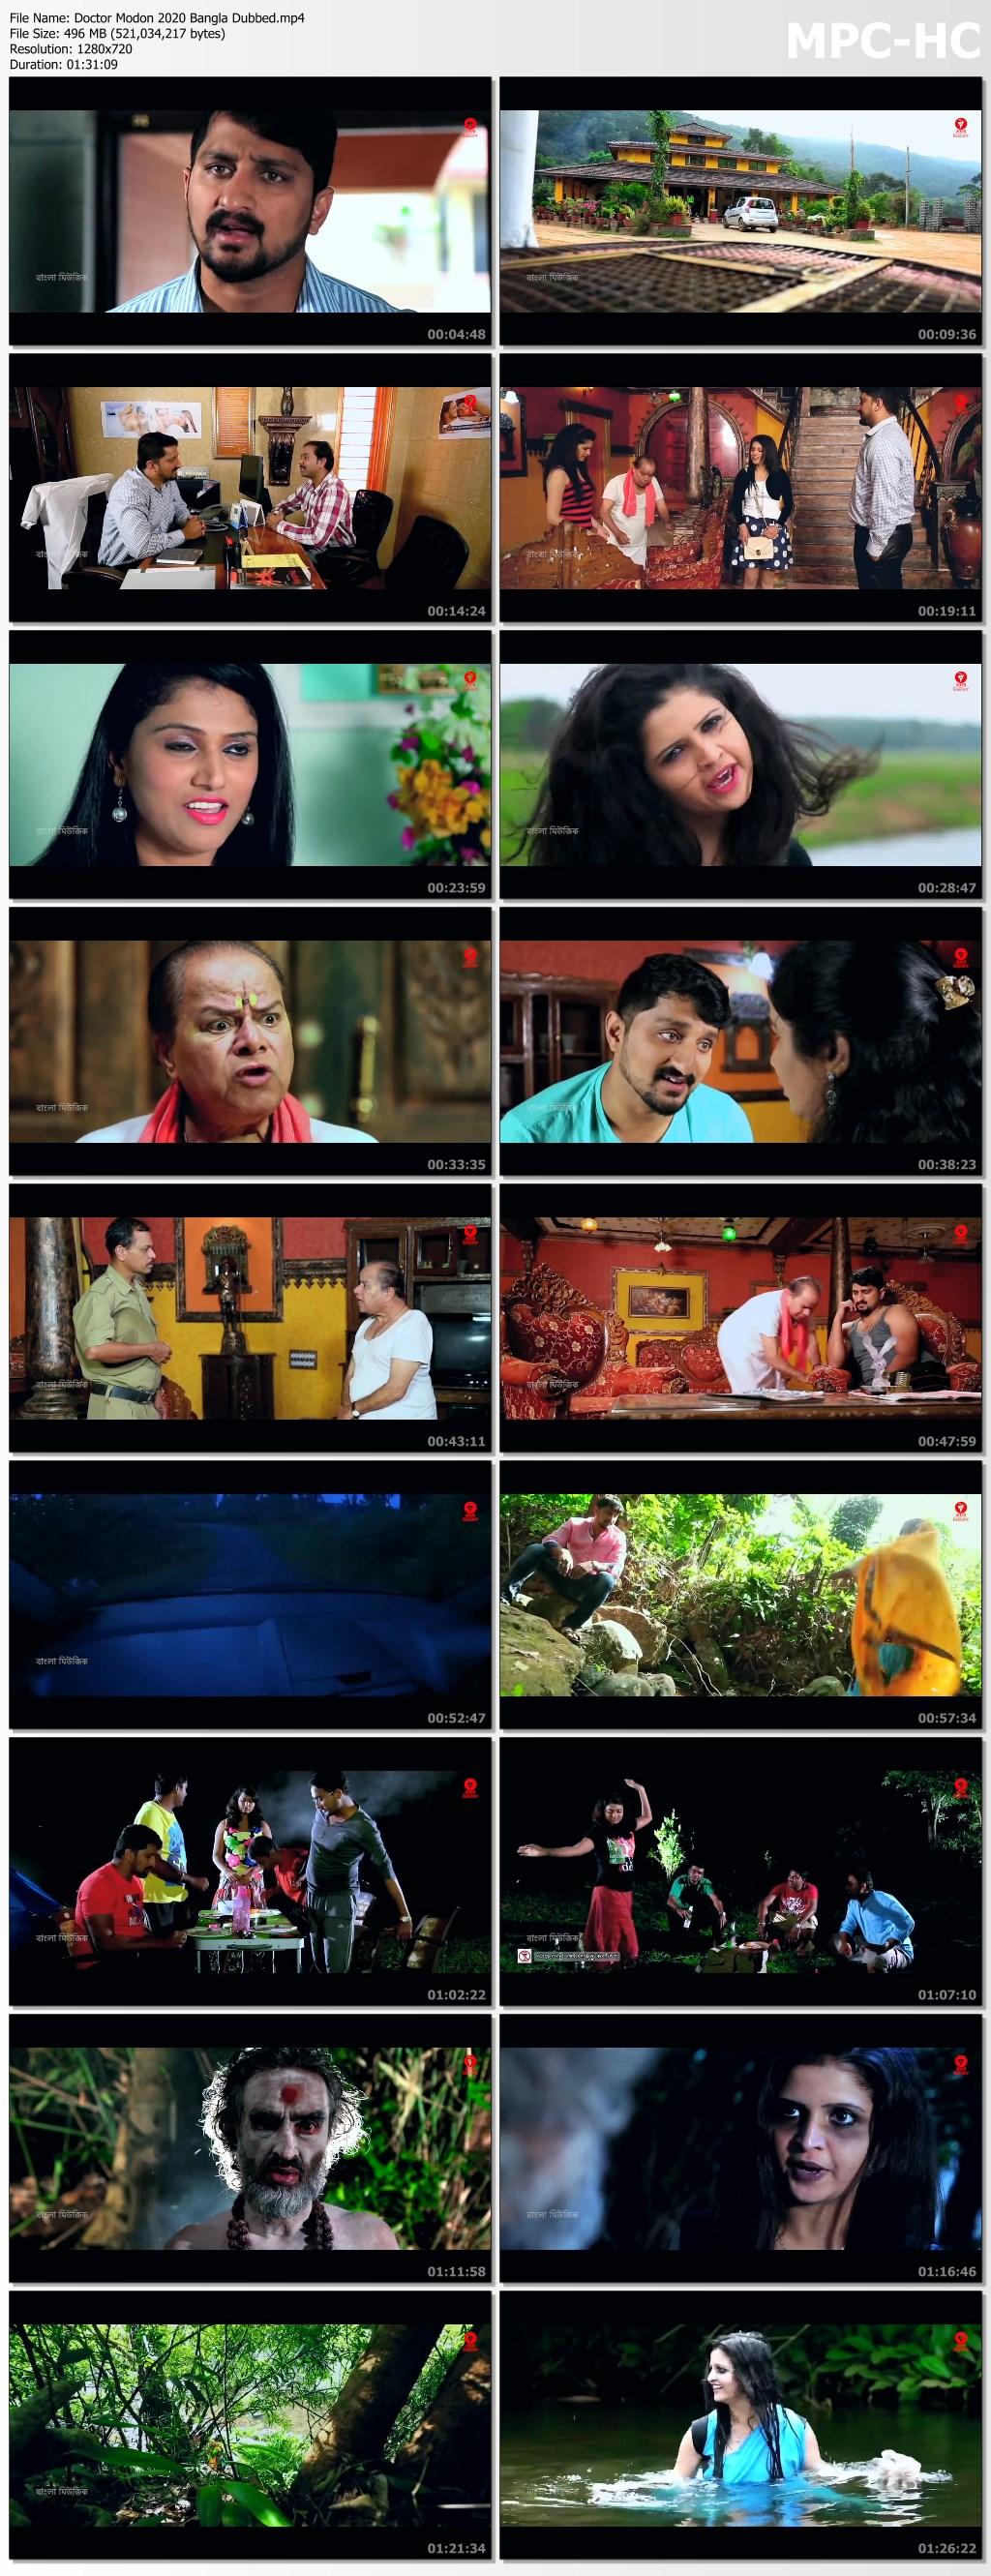 Doctor Modon 2020 Bangla Dubbed.mp4 thumbs